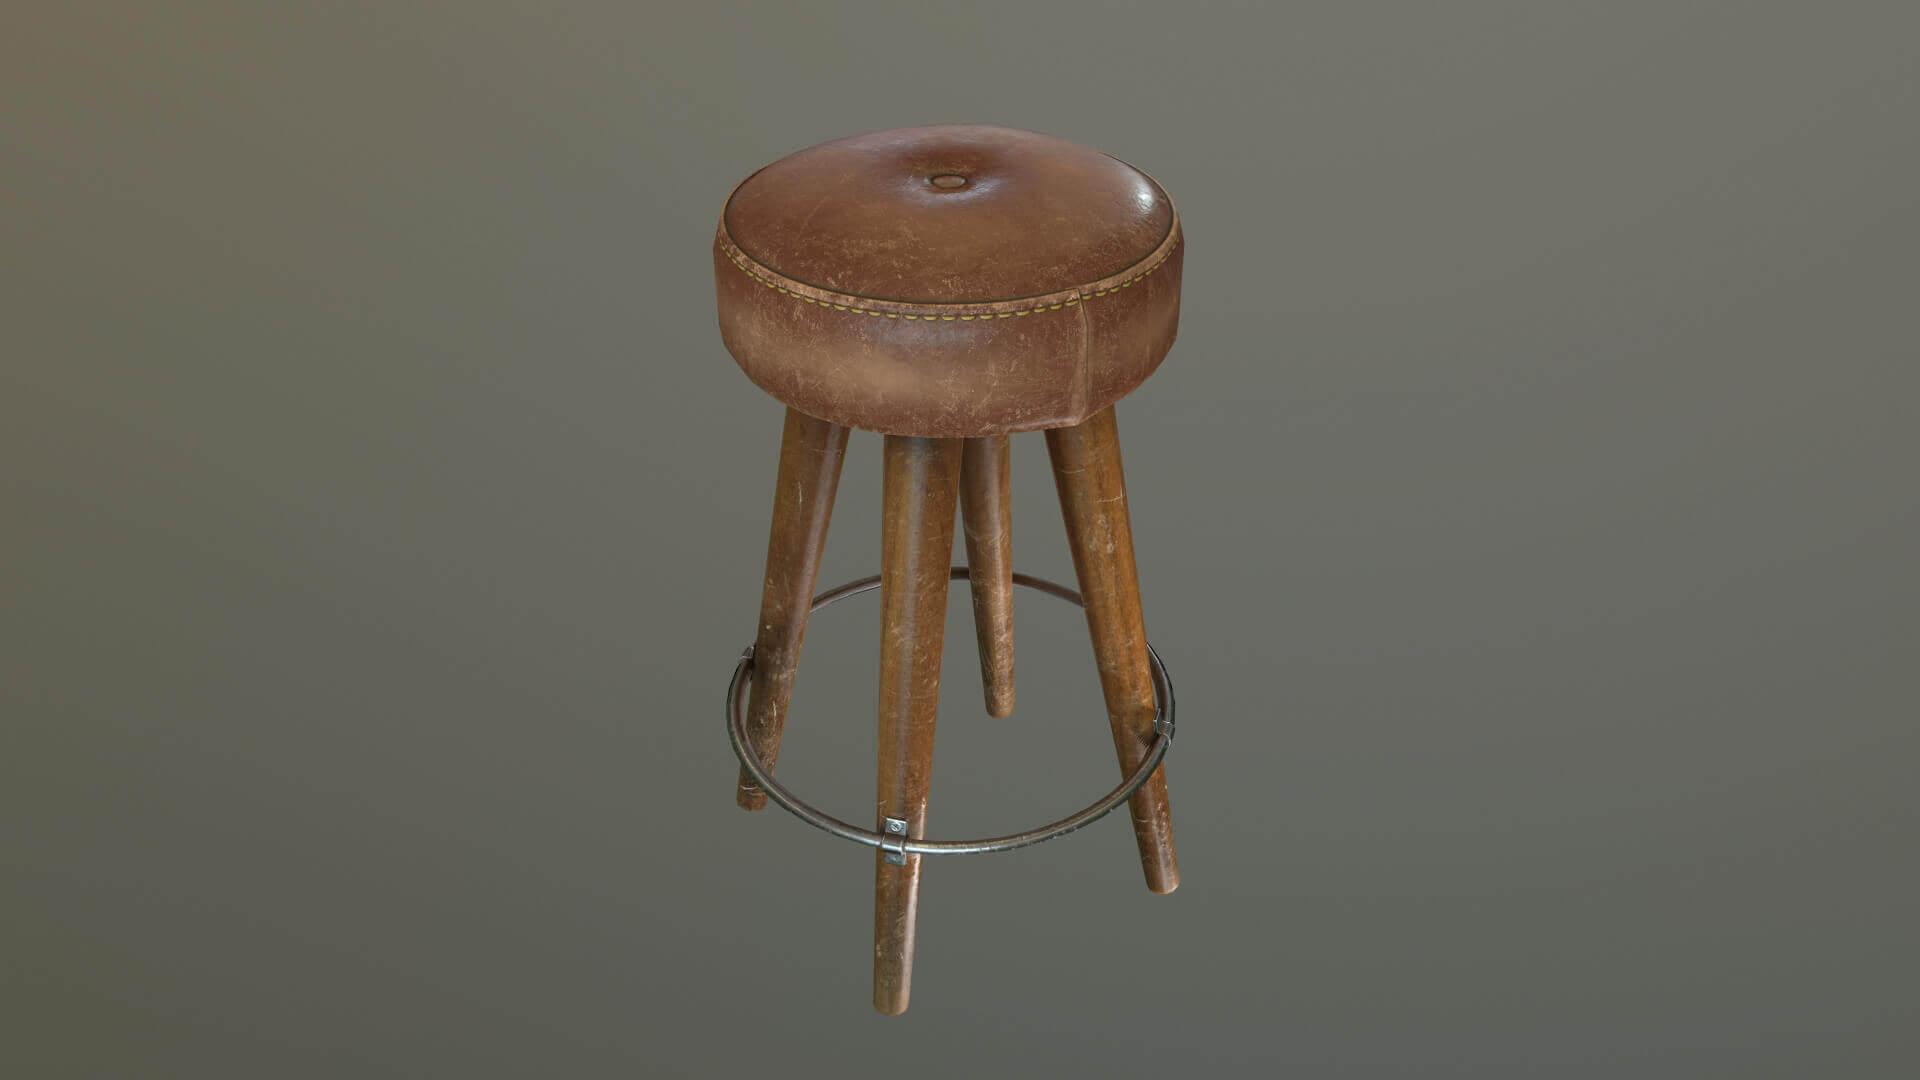 Phenomenal Leather Bar Stool 3D Model Machost Co Dining Chair Design Ideas Machostcouk